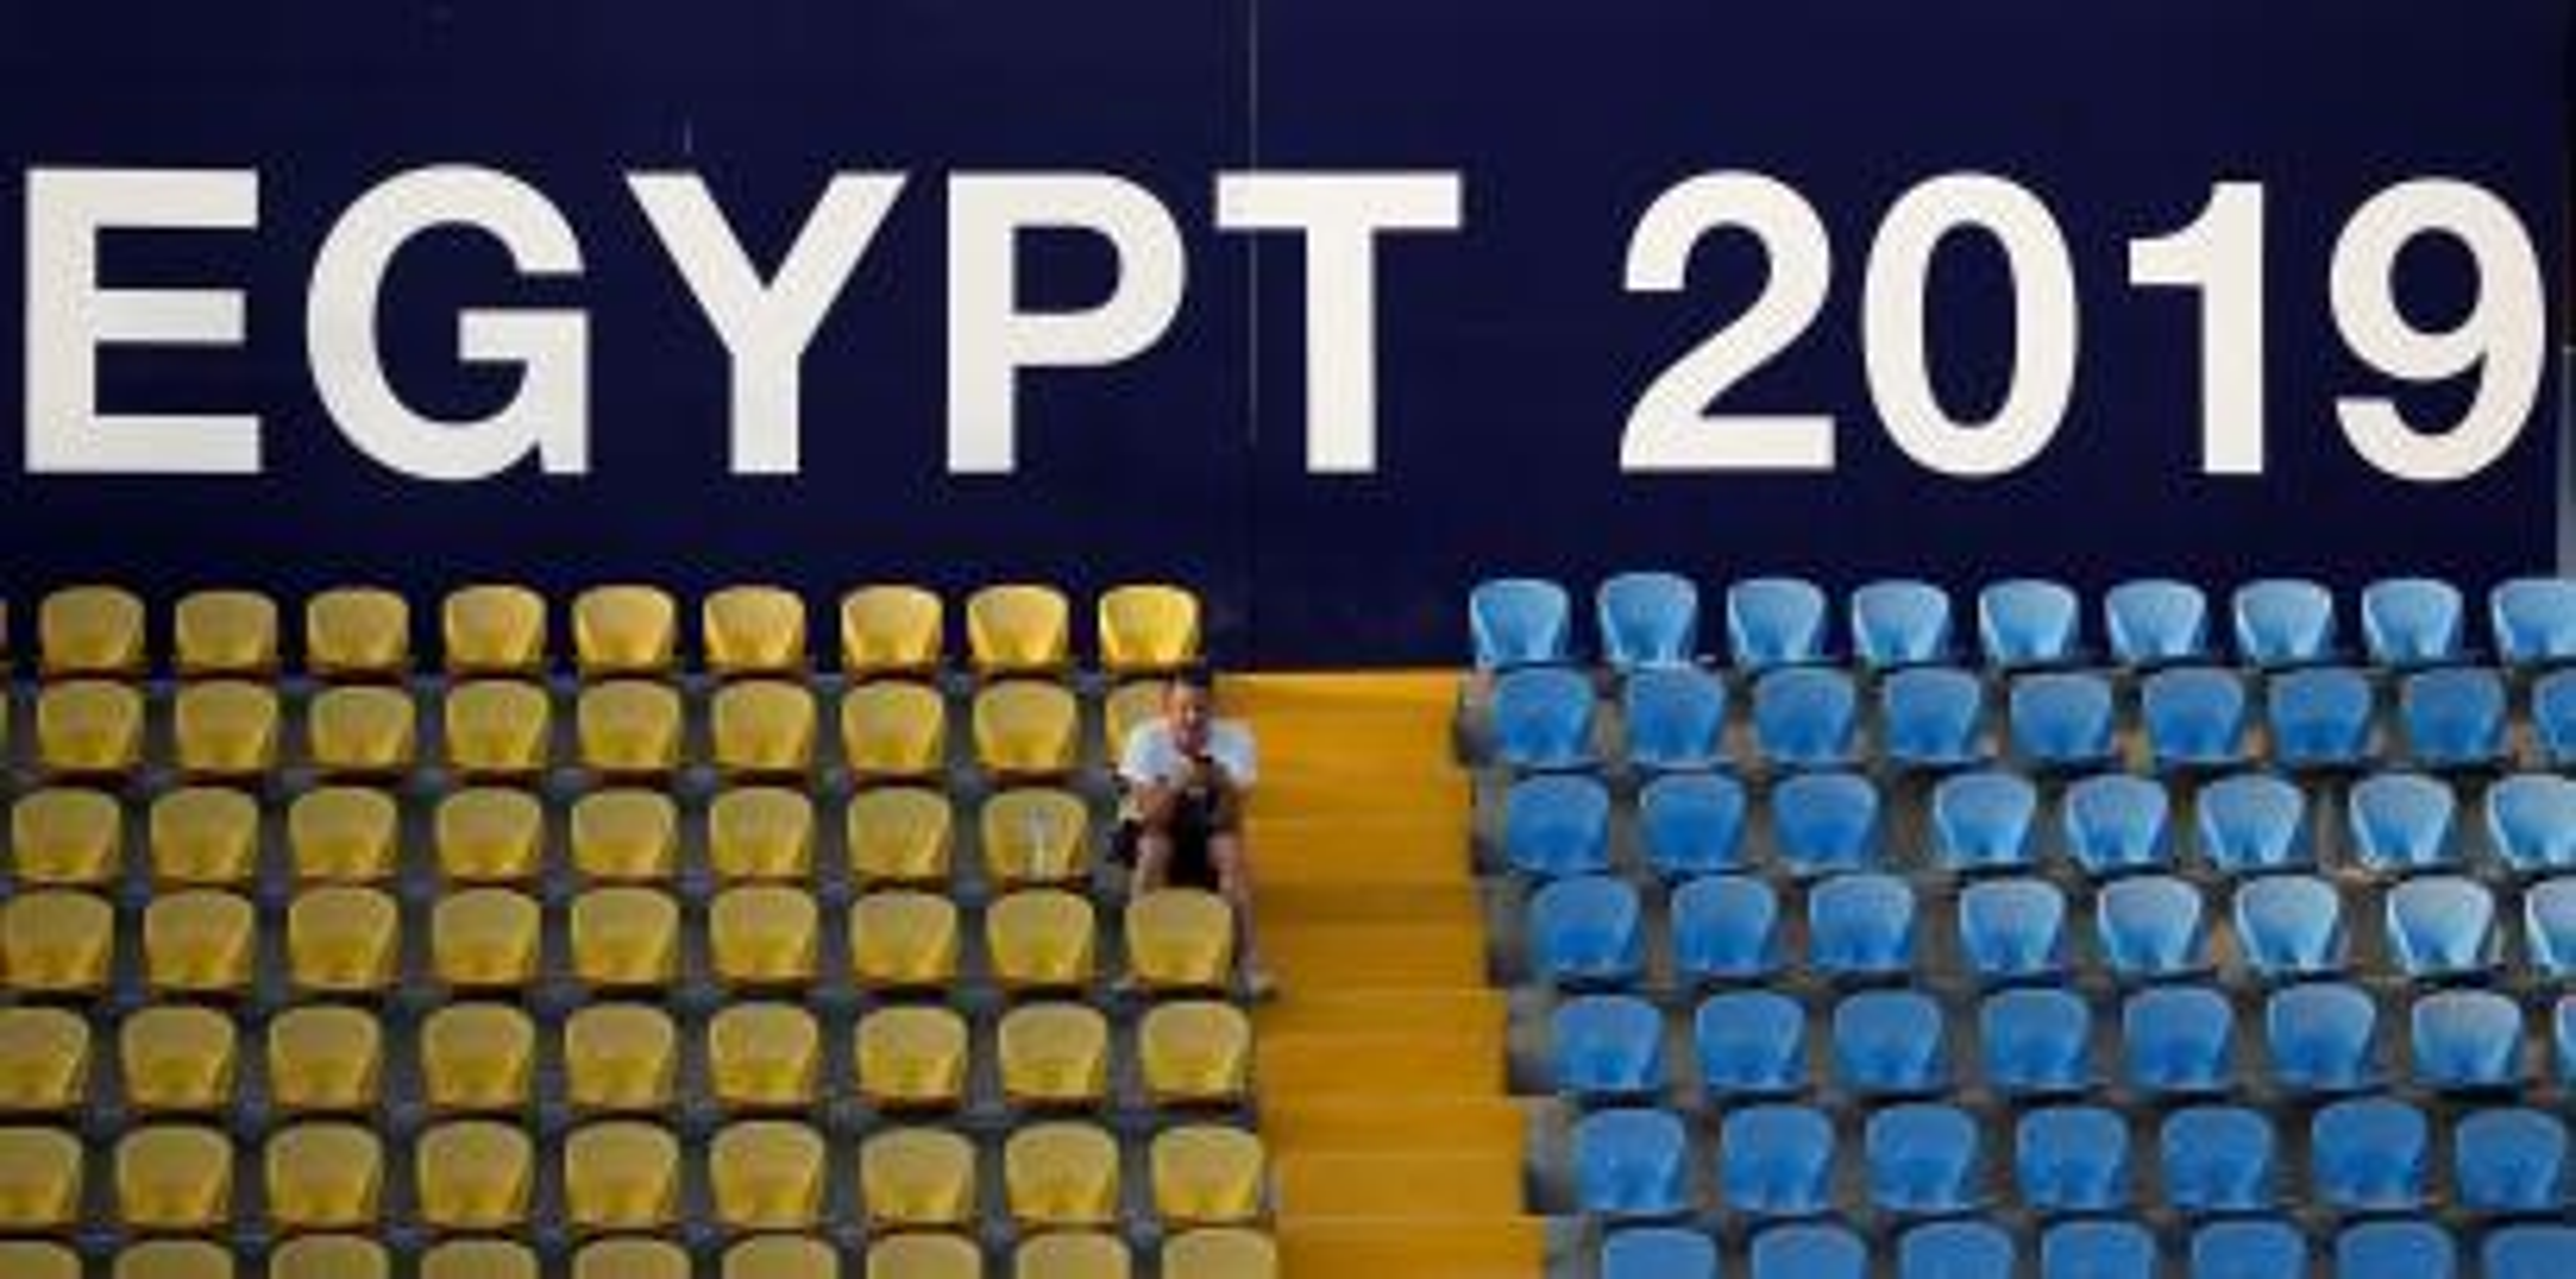 AFCON 2019: Egypt visa hurdles keeping African football fans home